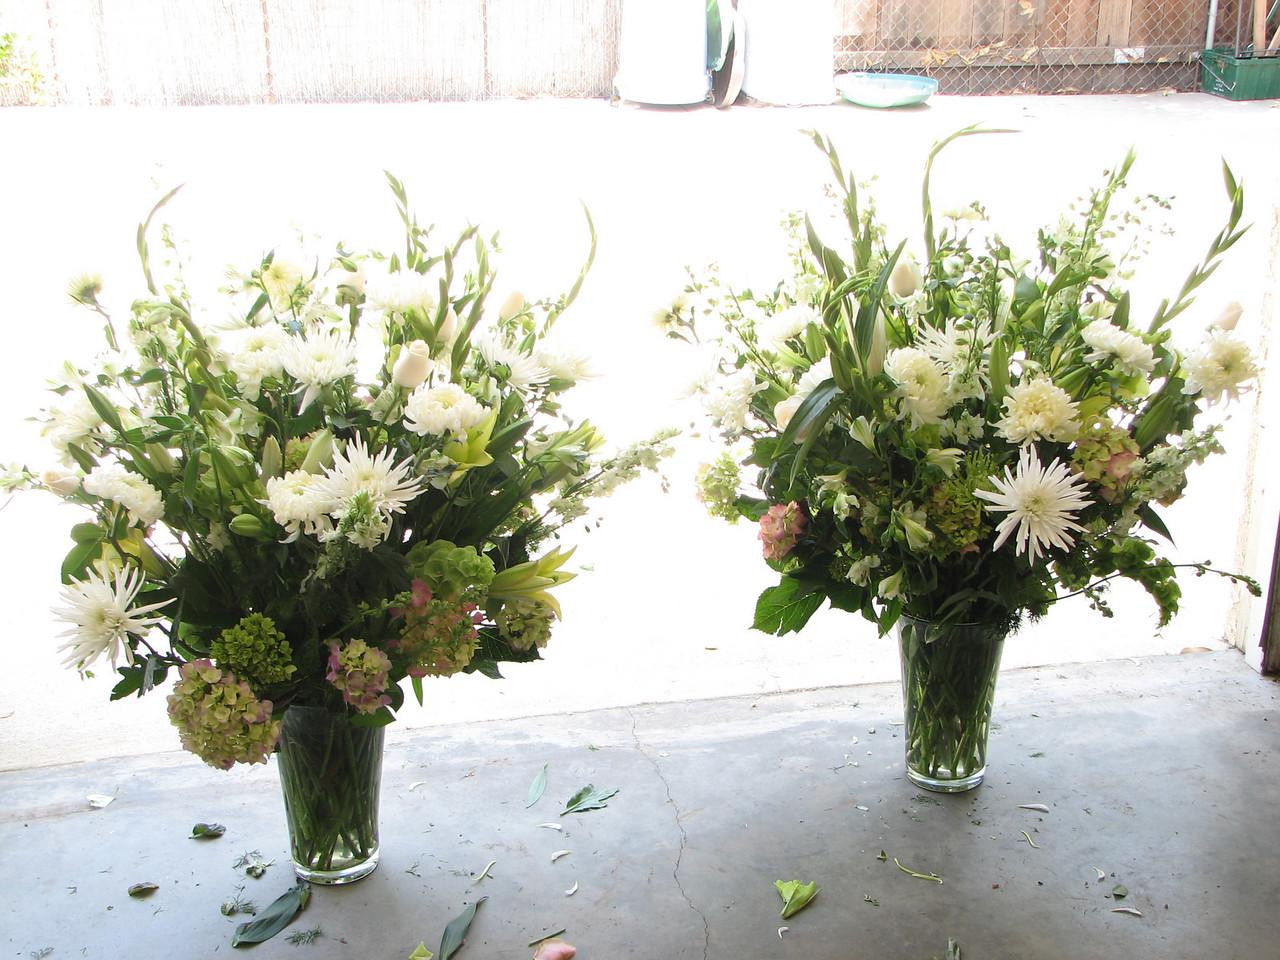 2007 06 09 Sat - Head bouquets - brighter